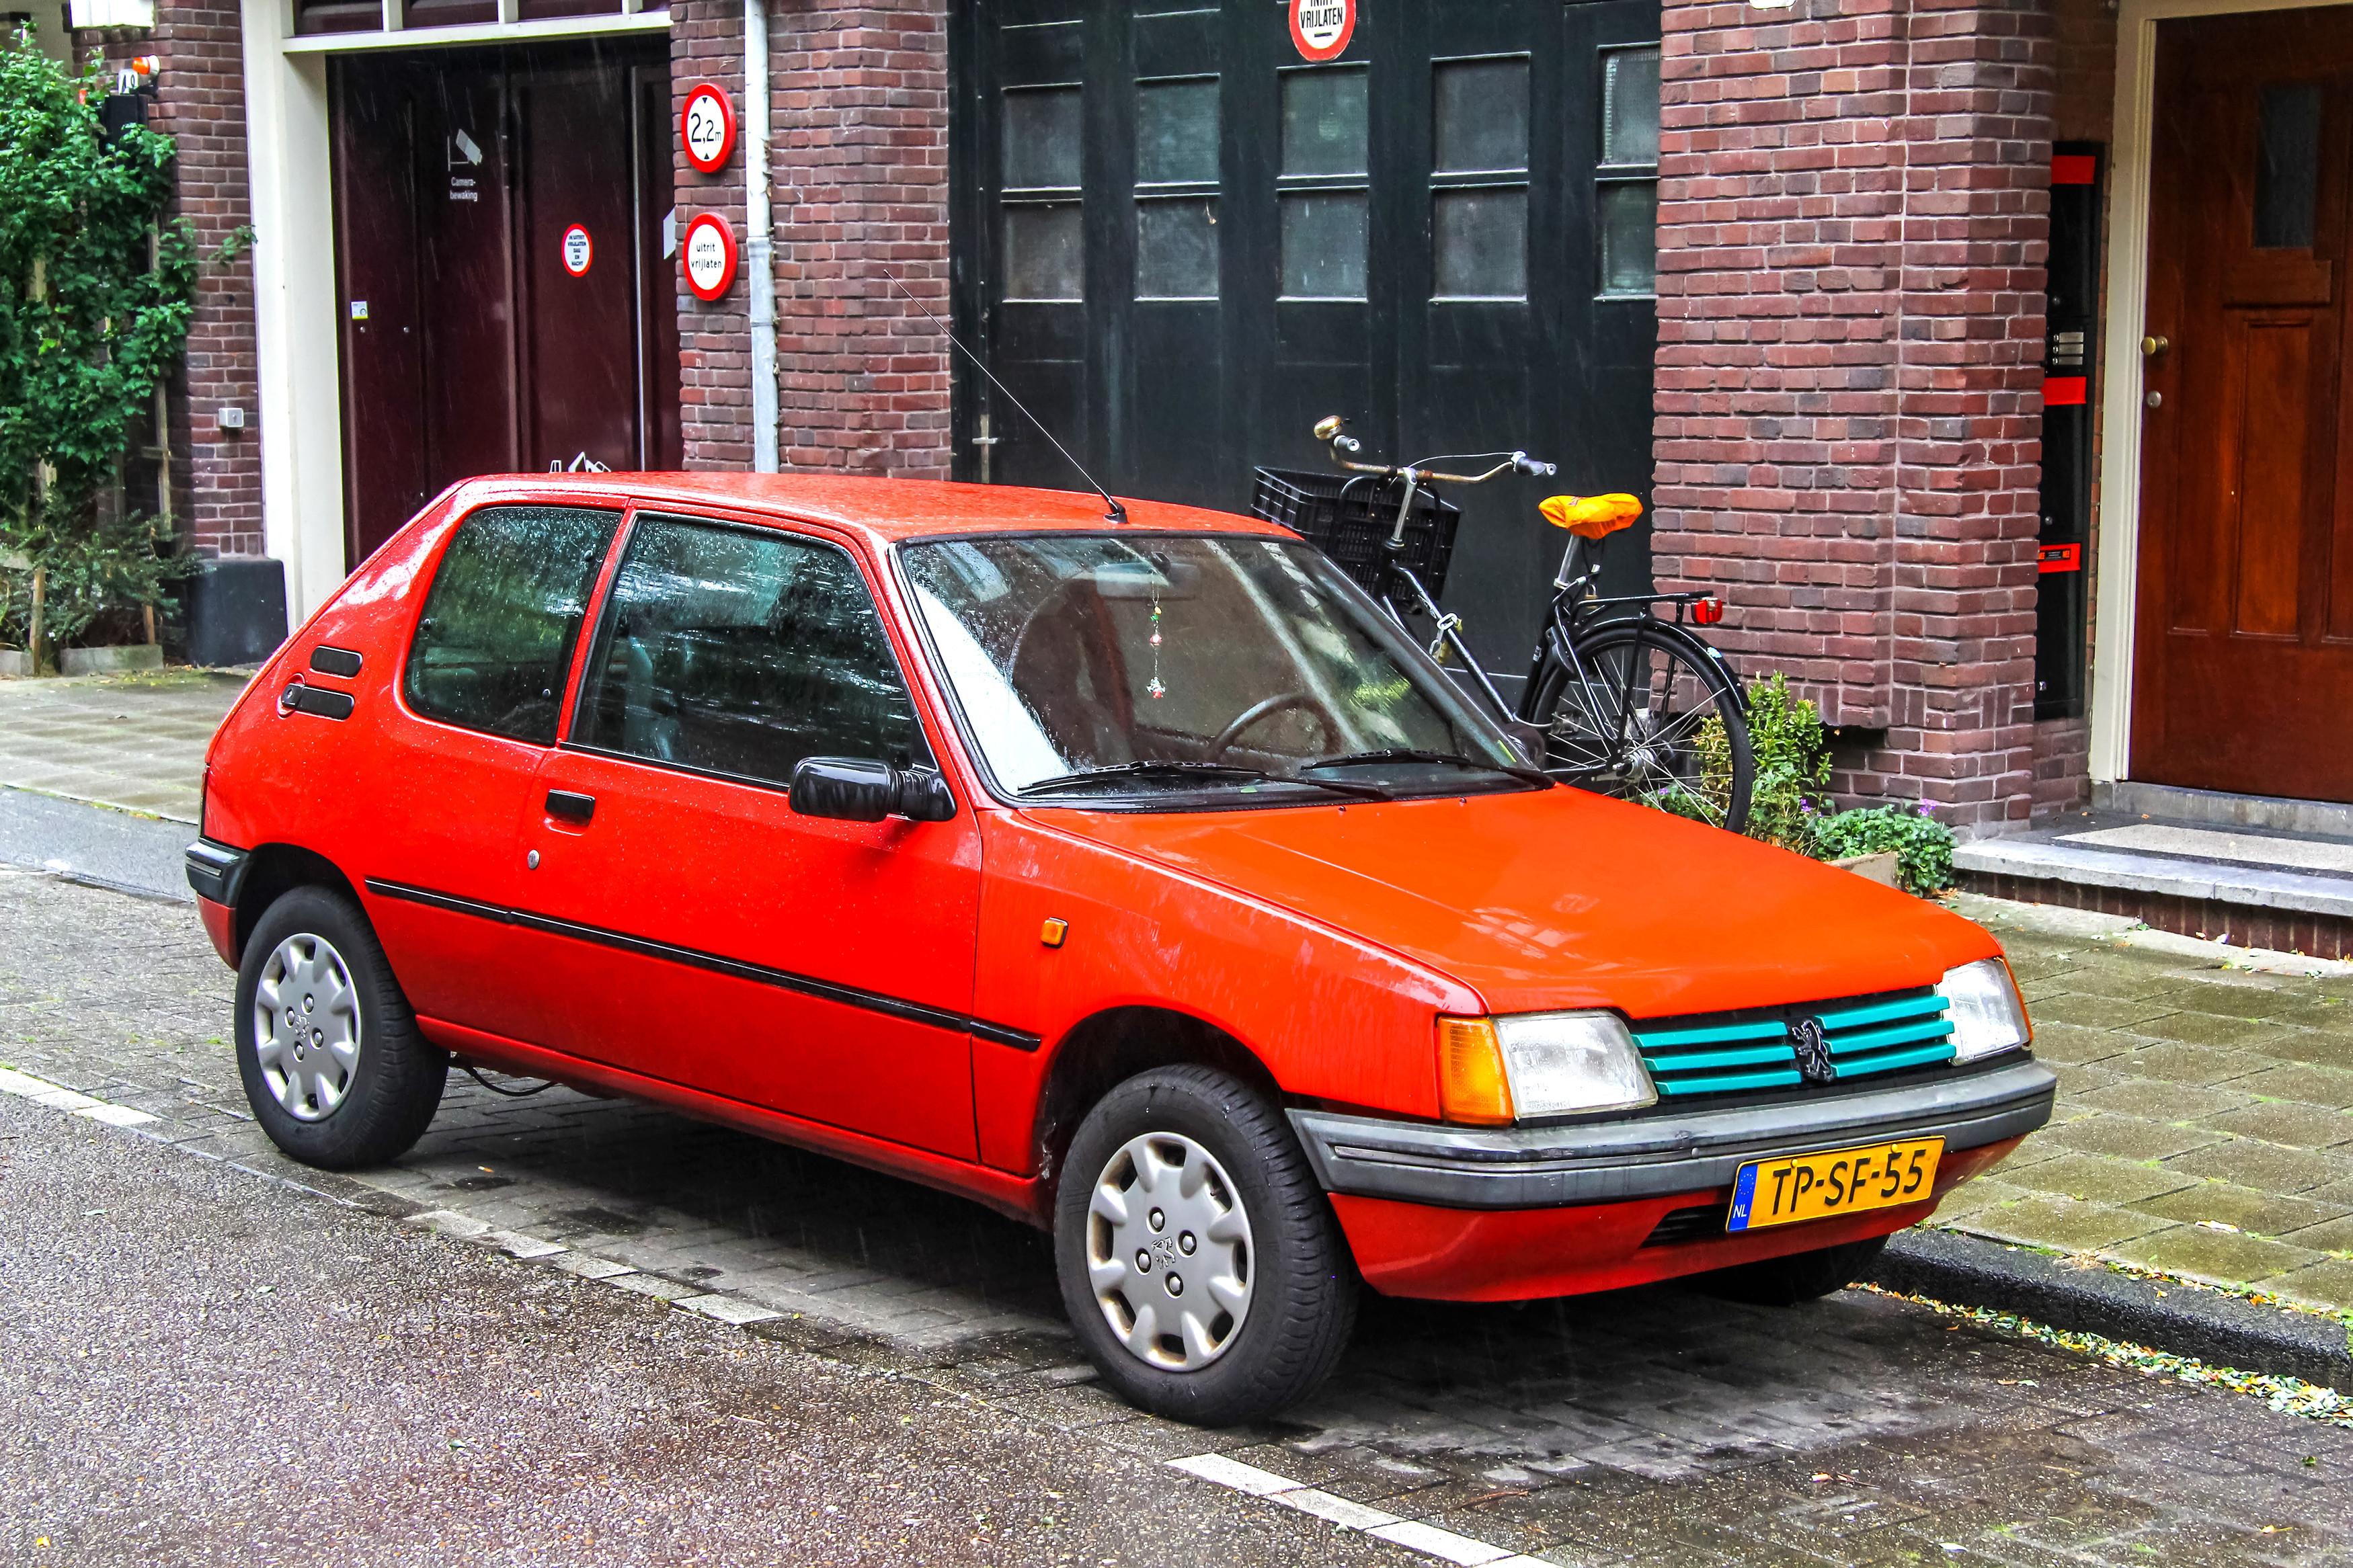 O primeiro carro das celebridades